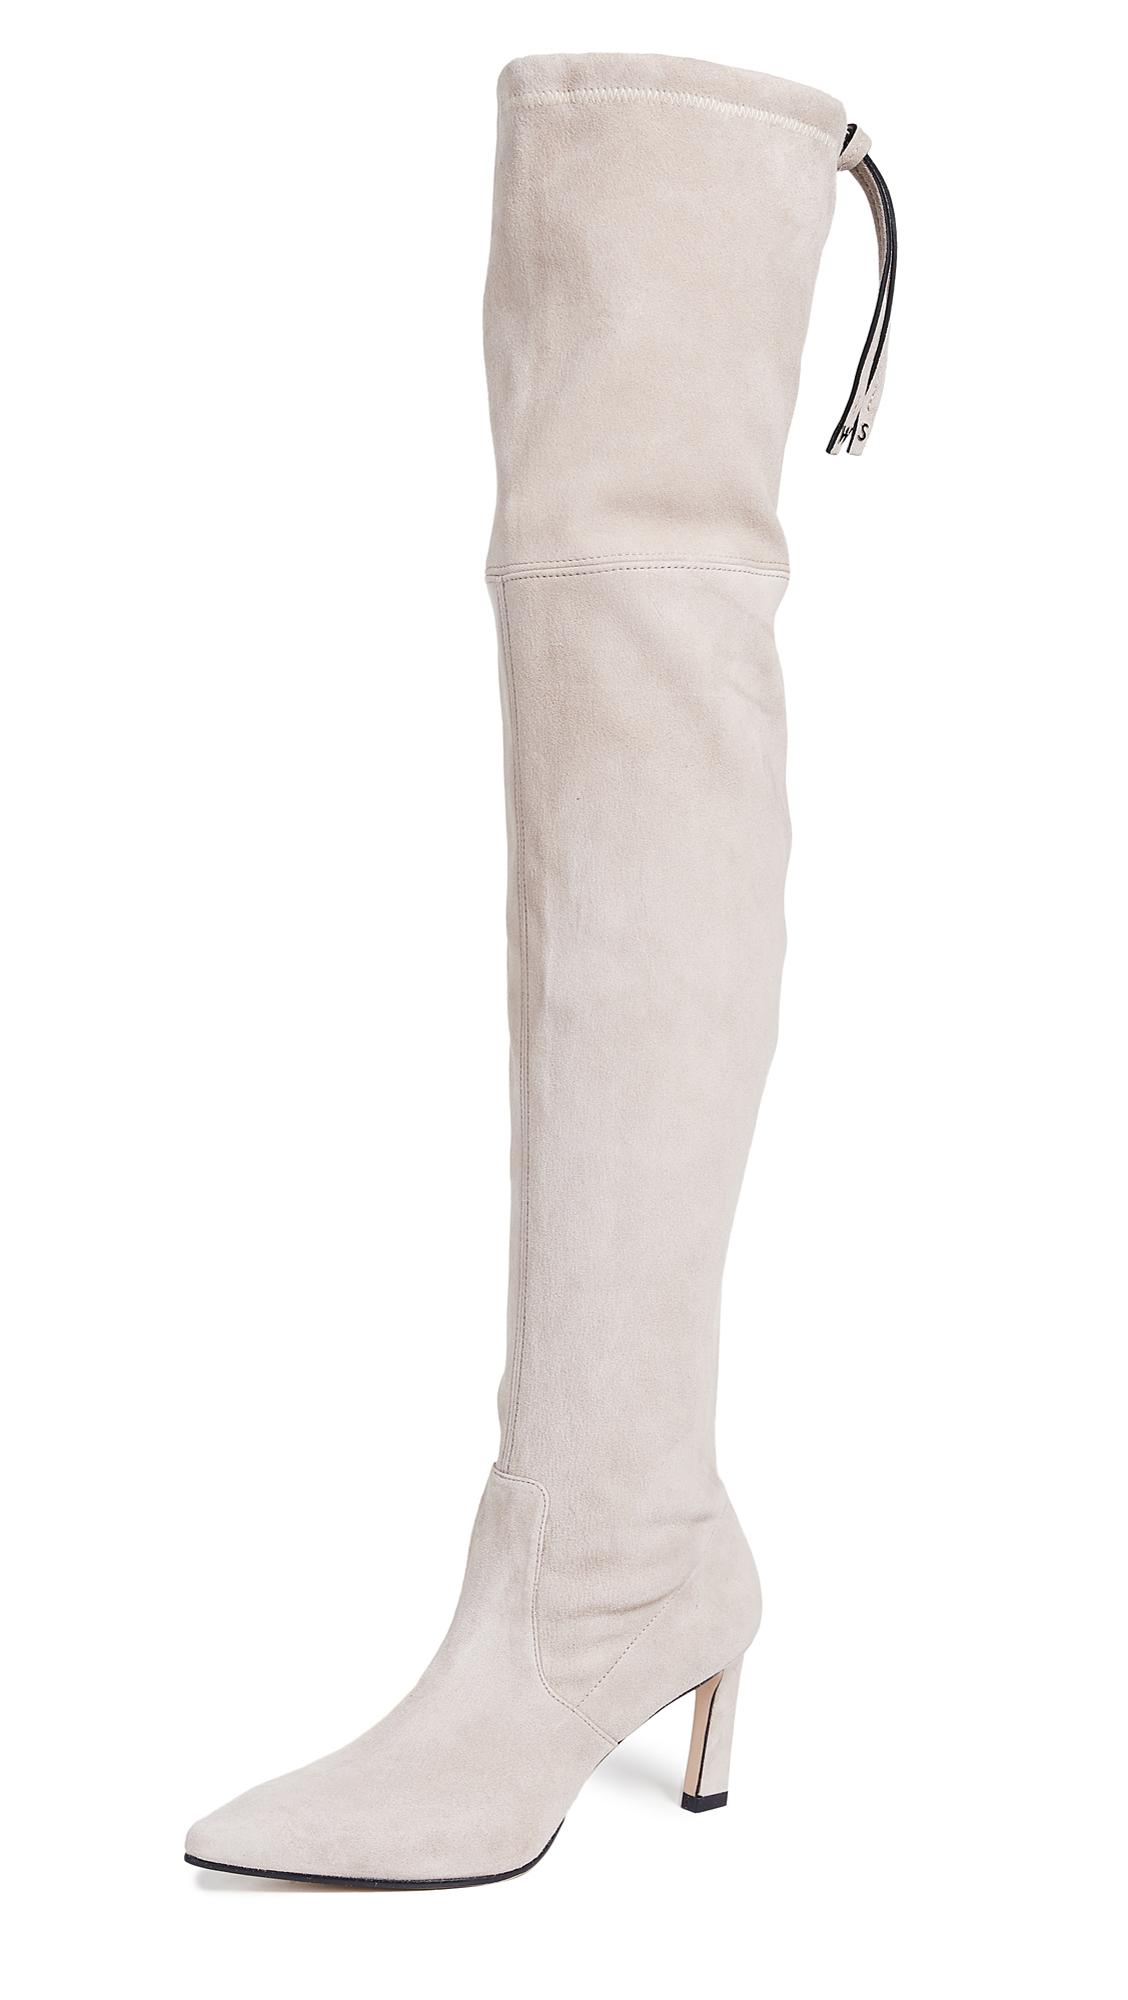 Stuart Weitzman Natalia 75mm Boots - Pebble